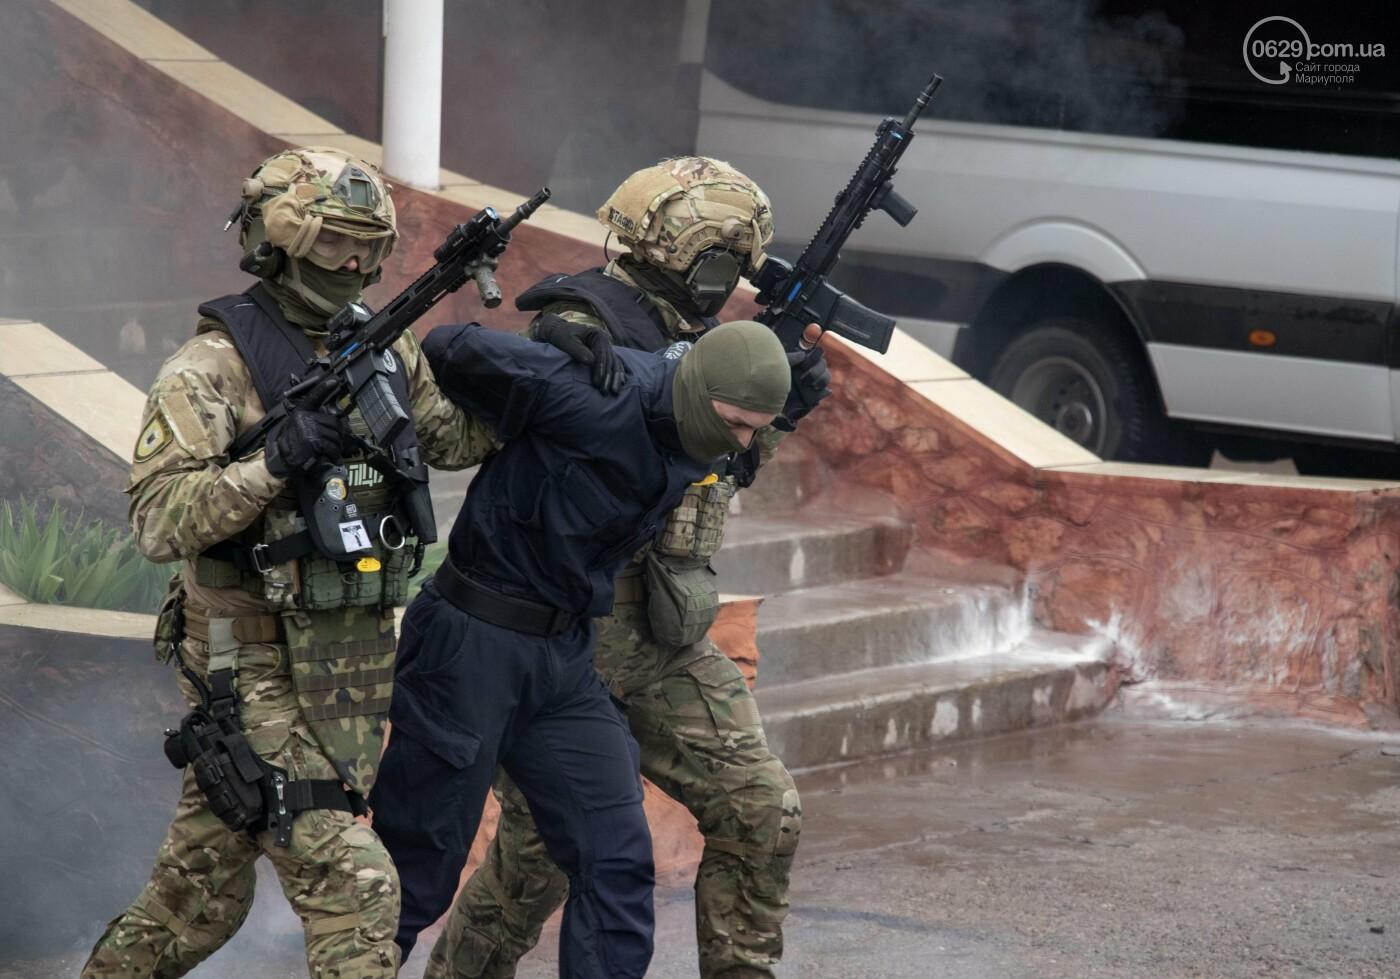 """Враг понесет потери"". Как в Мариуполе силовики учились уничтожать врага на суше и на море, - ФОТО+ВИДЕО, фото-10"